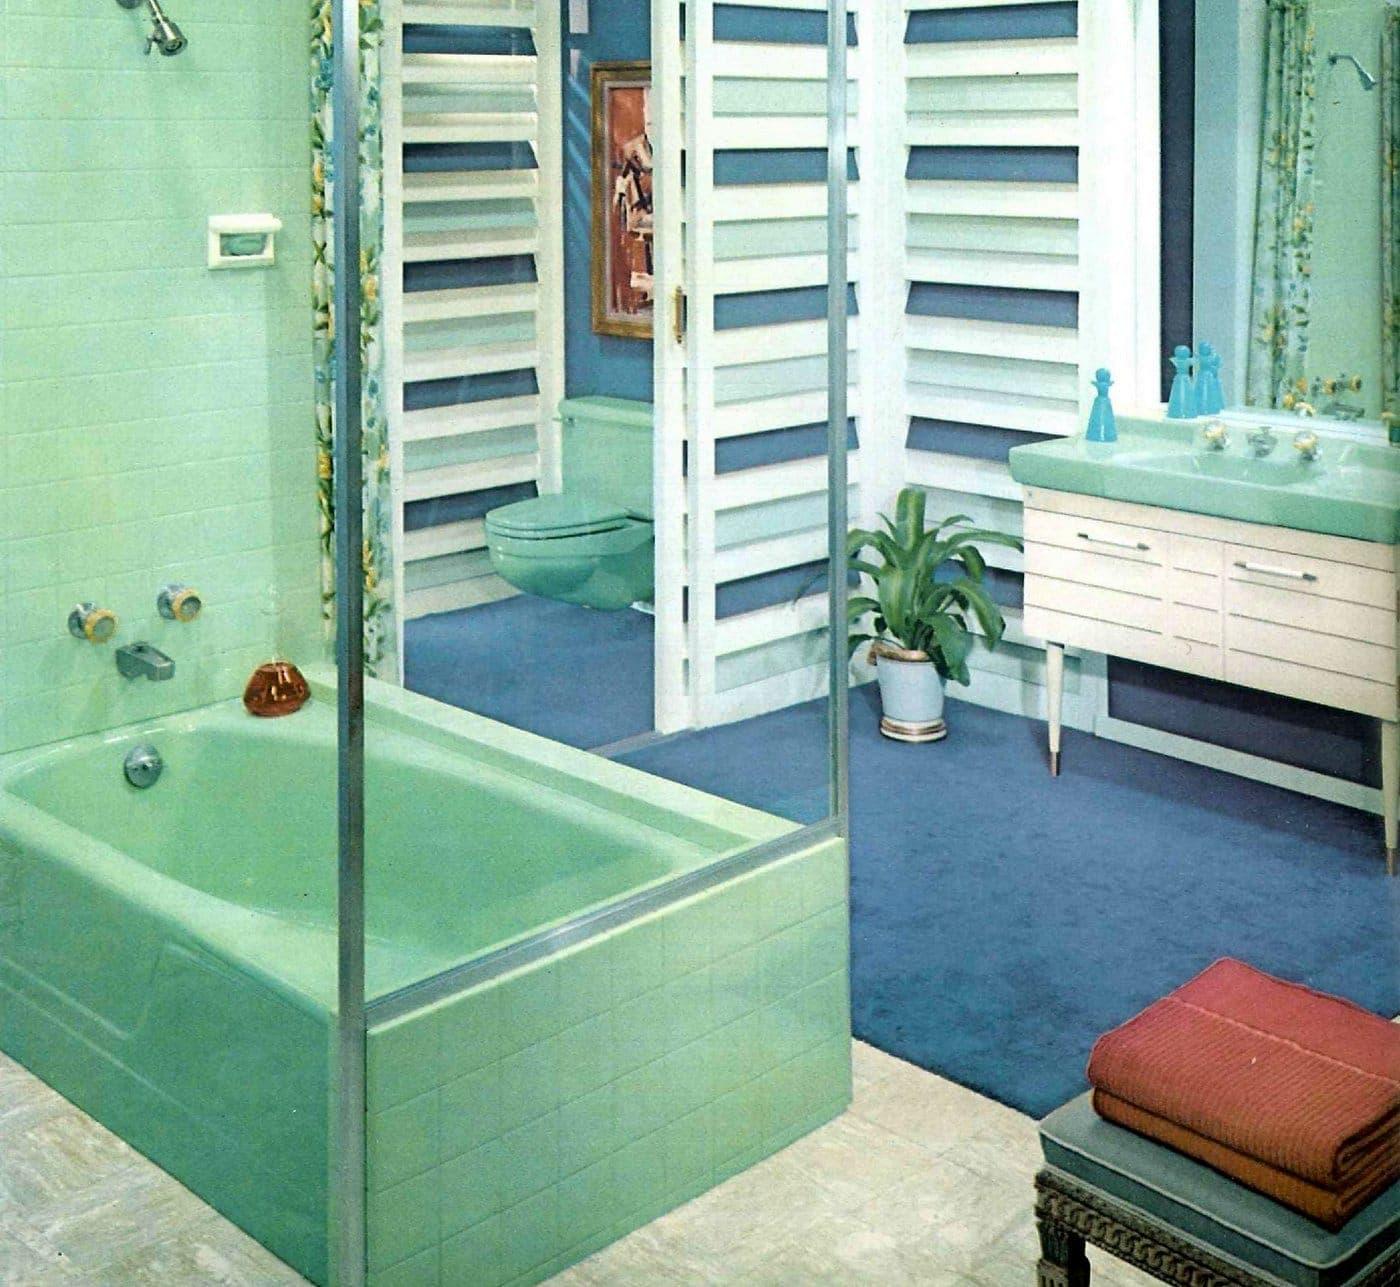 Vintage bathroom style ideas from 1962 (8)